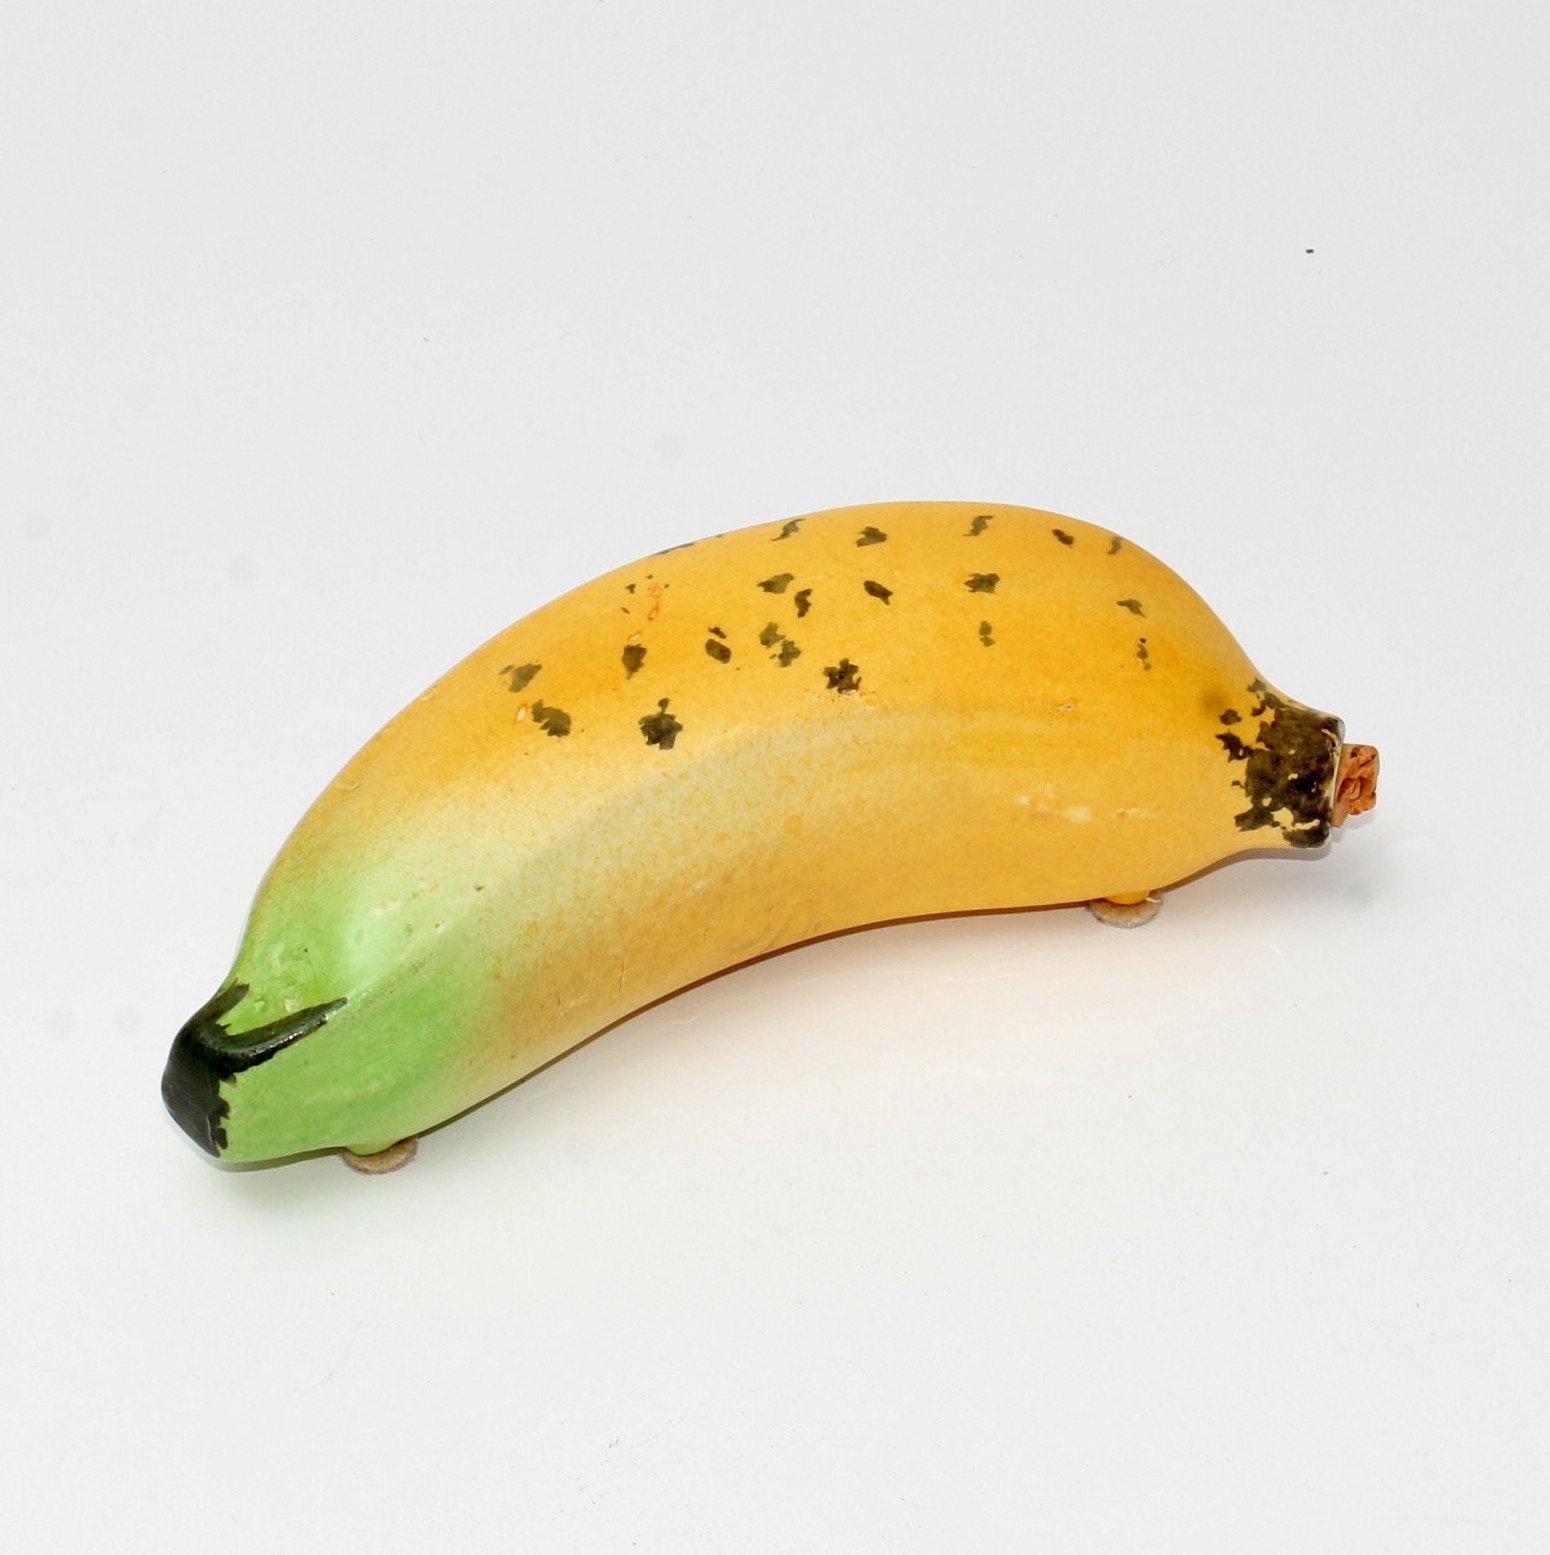 Vintage Hand-Painted Ceramic Banana